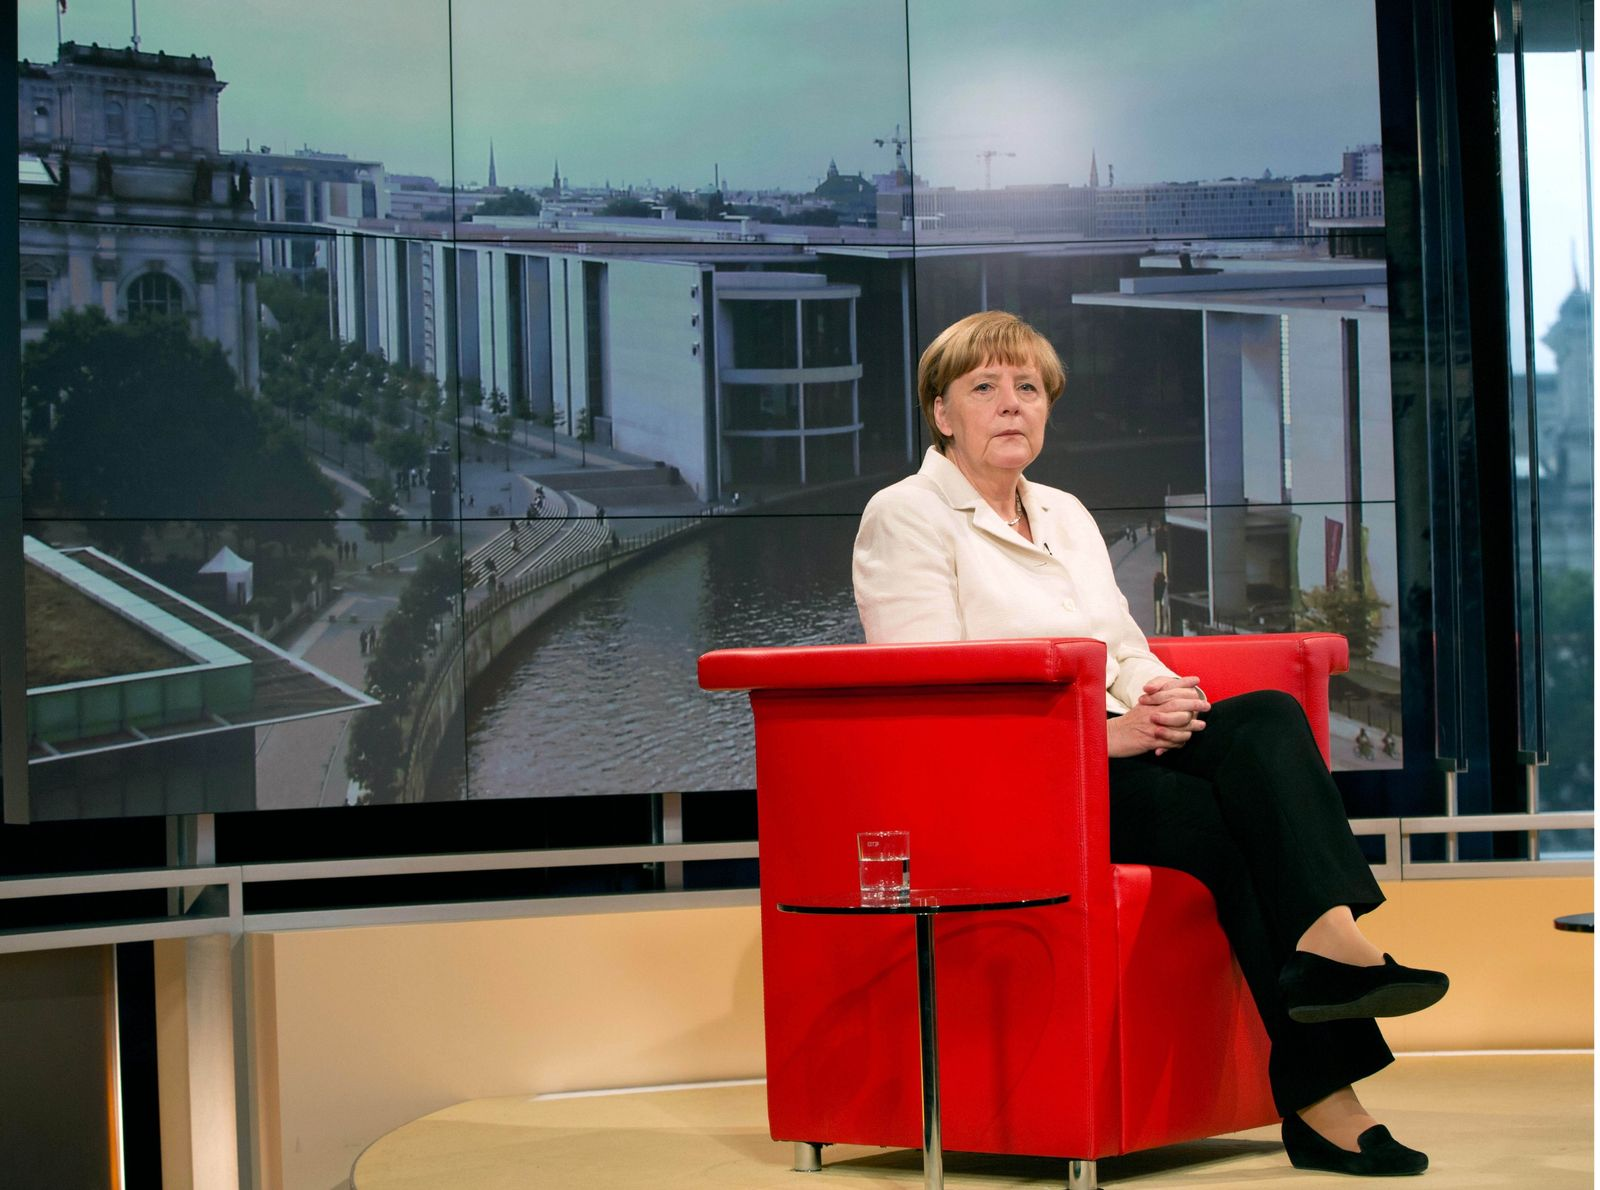 Kanzlerin Angela Merkel/ Netzpolitik.org